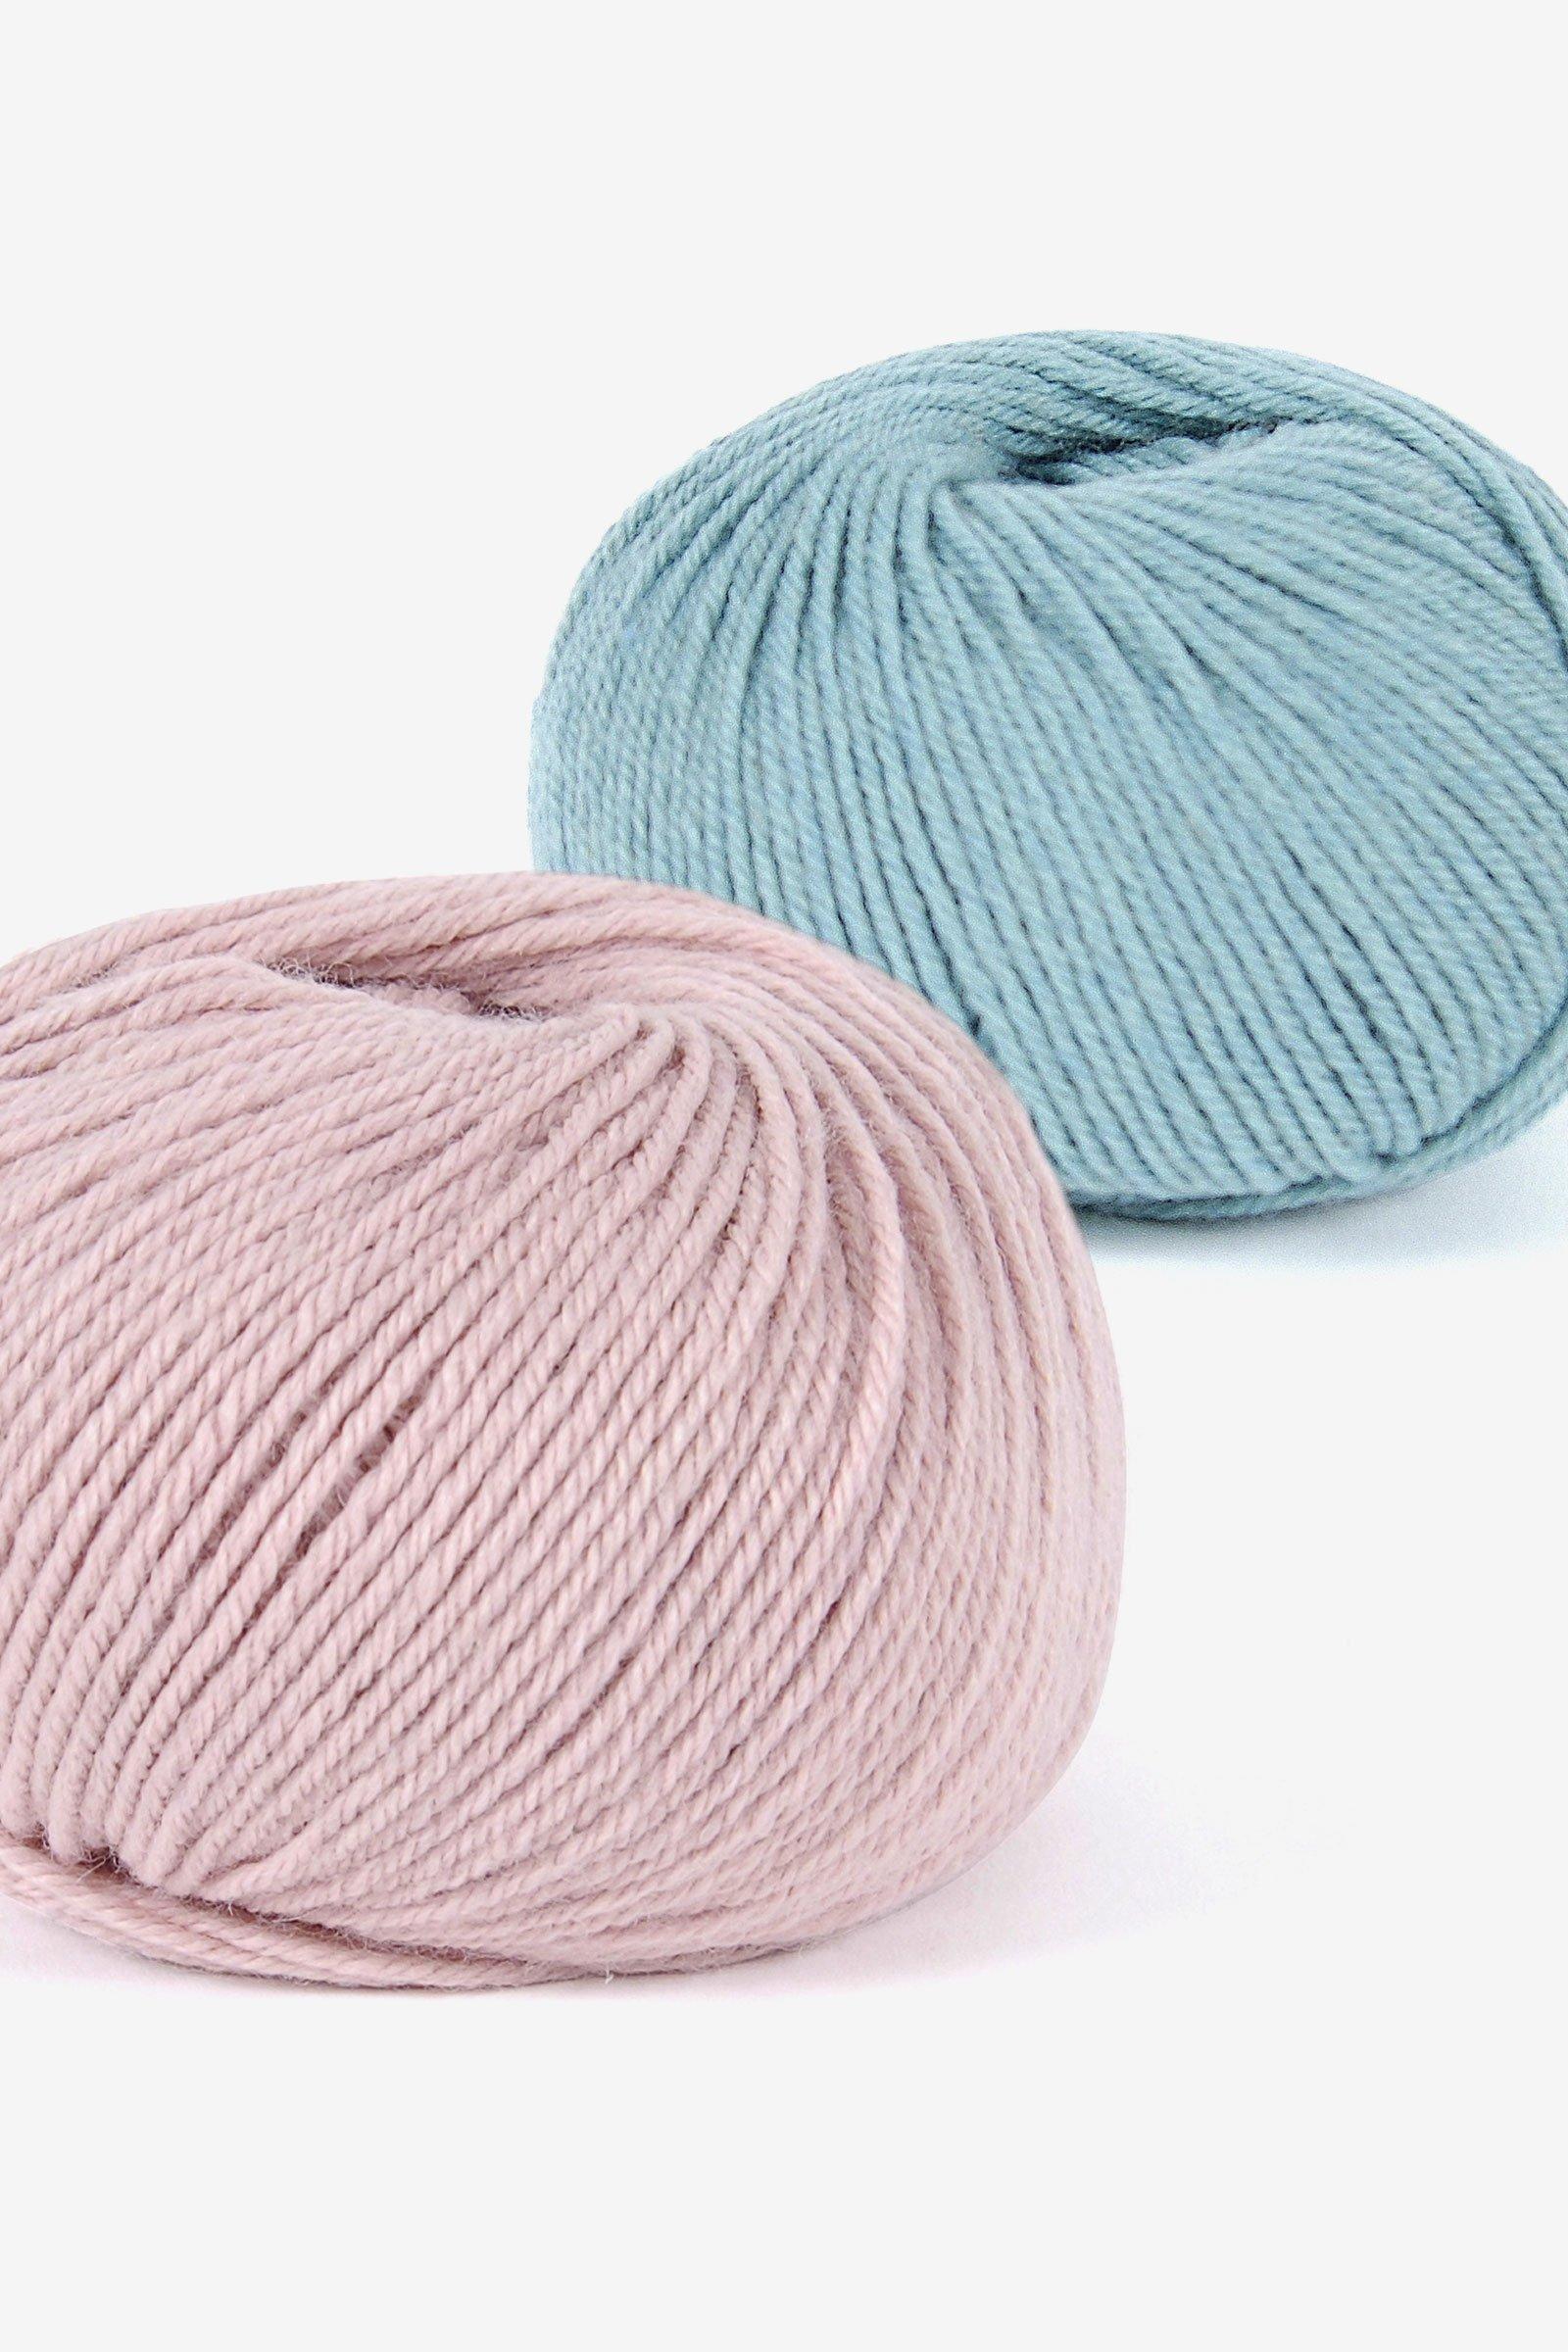 Lã Merino Essentiel 50g - 4